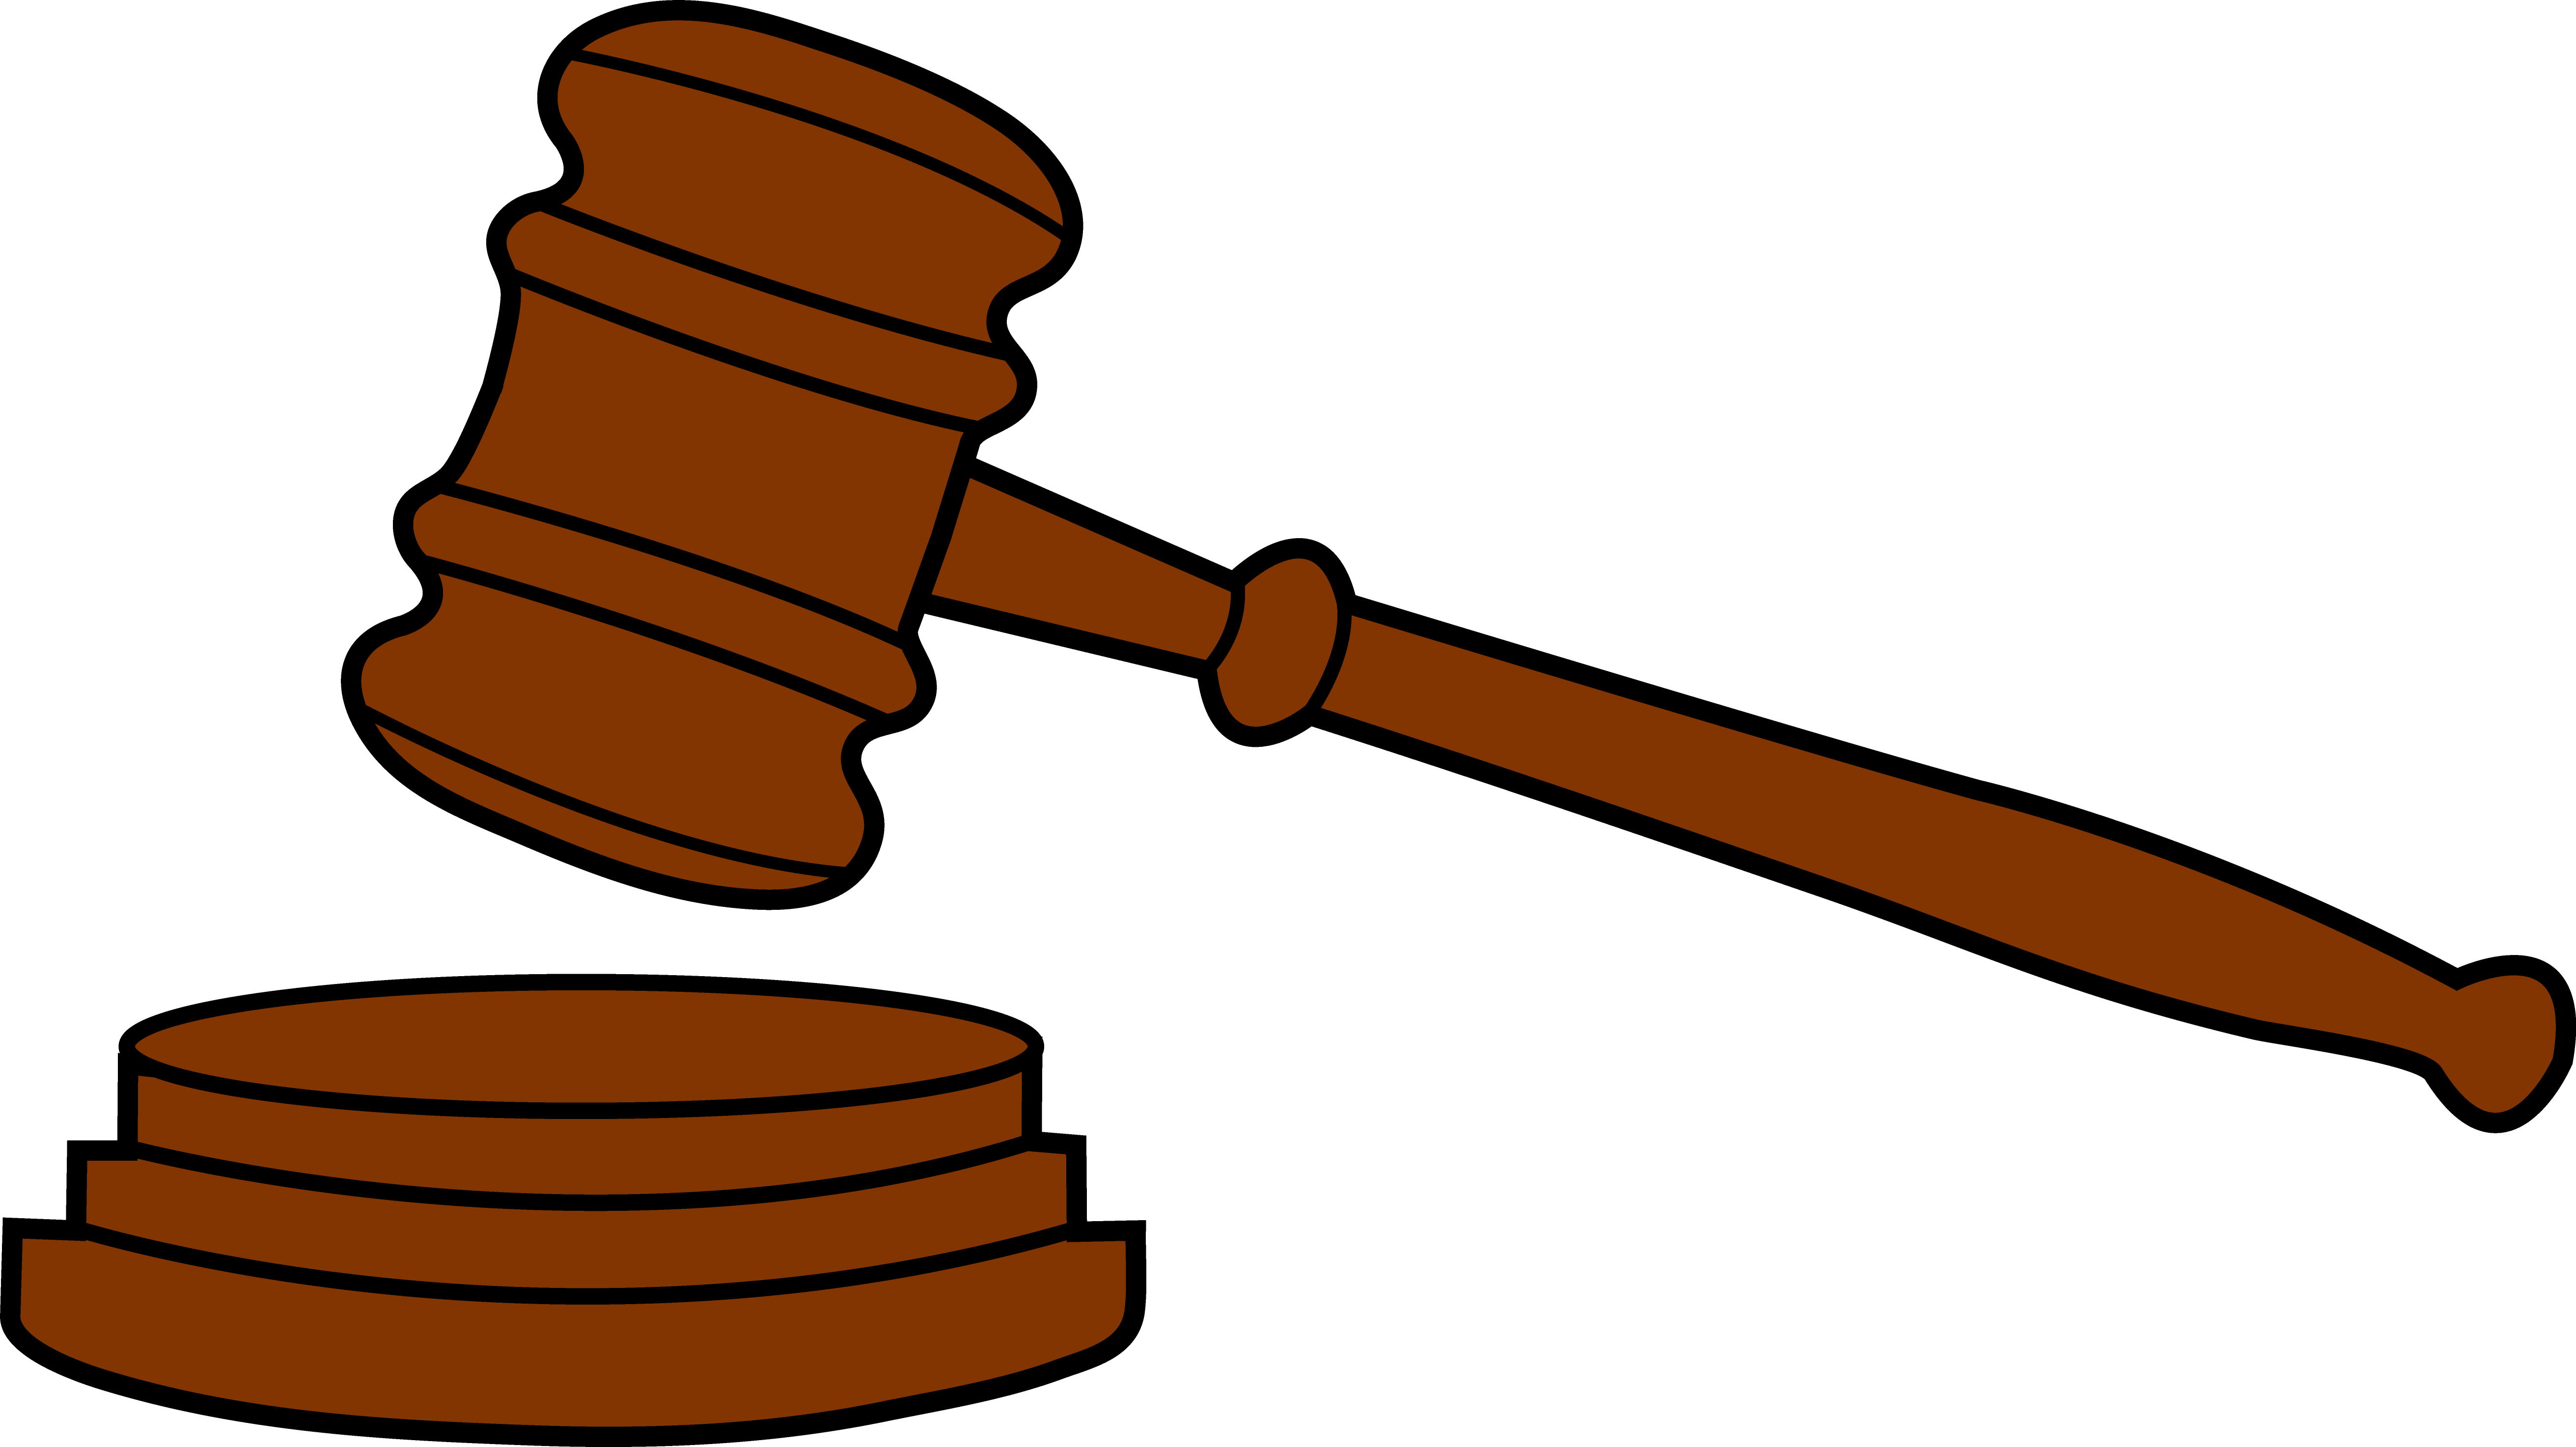 Attorney Clipart.